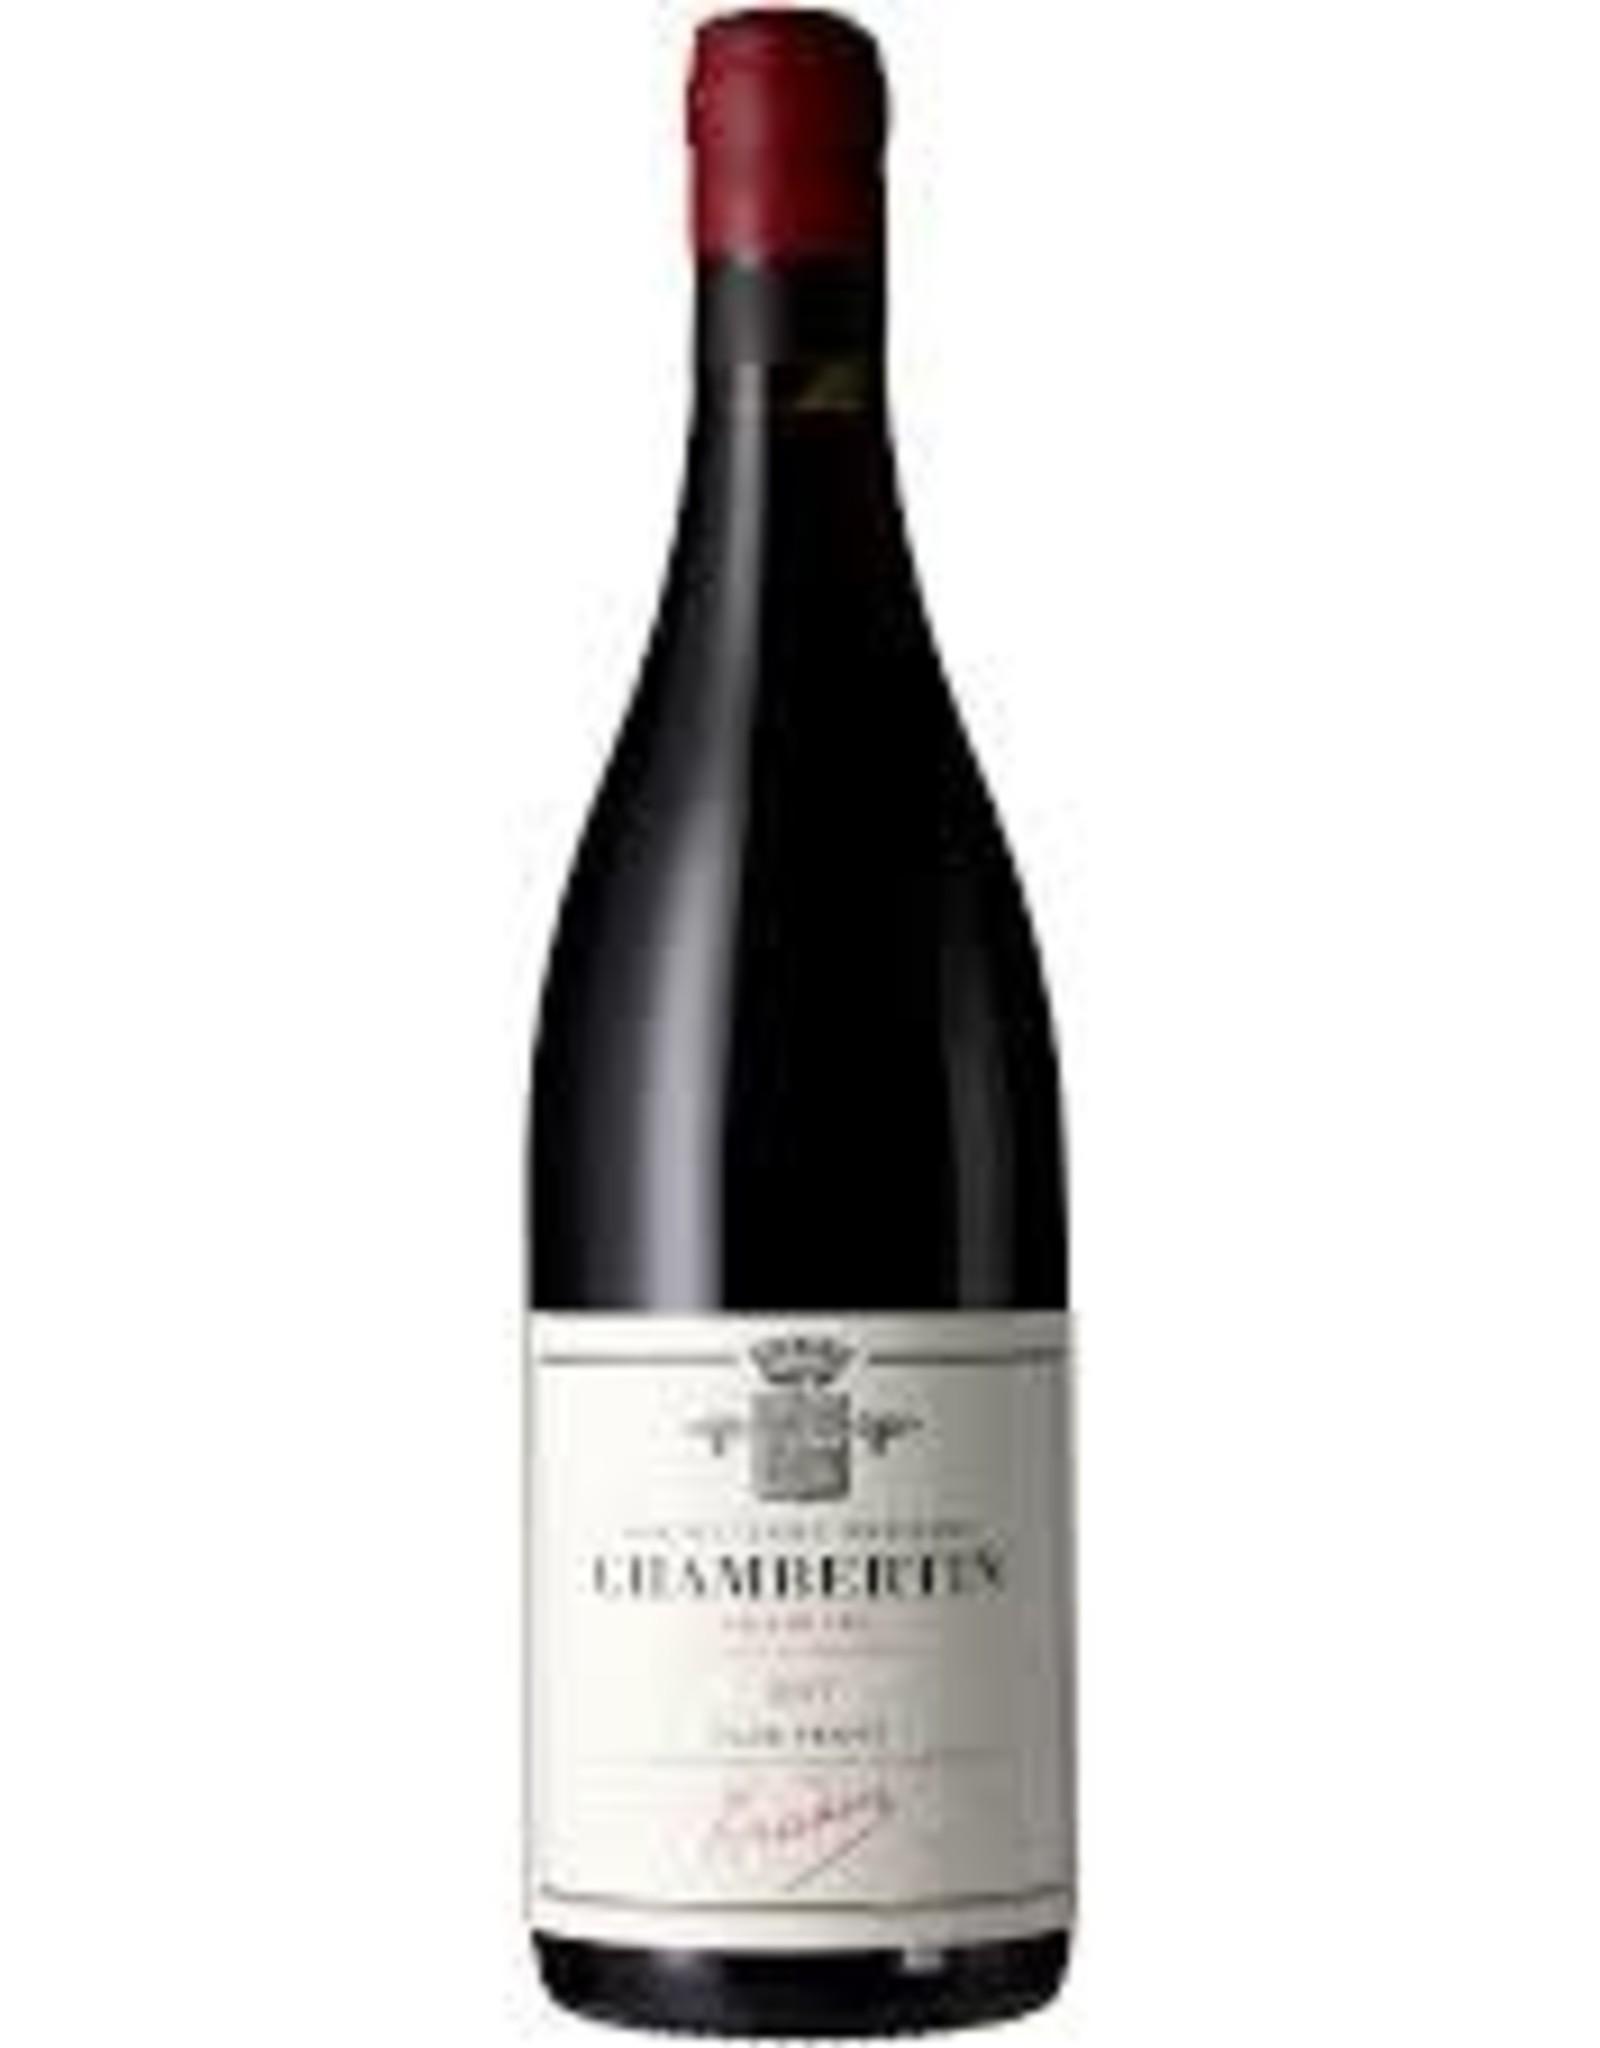 R Burgundy, Gevrey-Chambertin, Trapet 2017